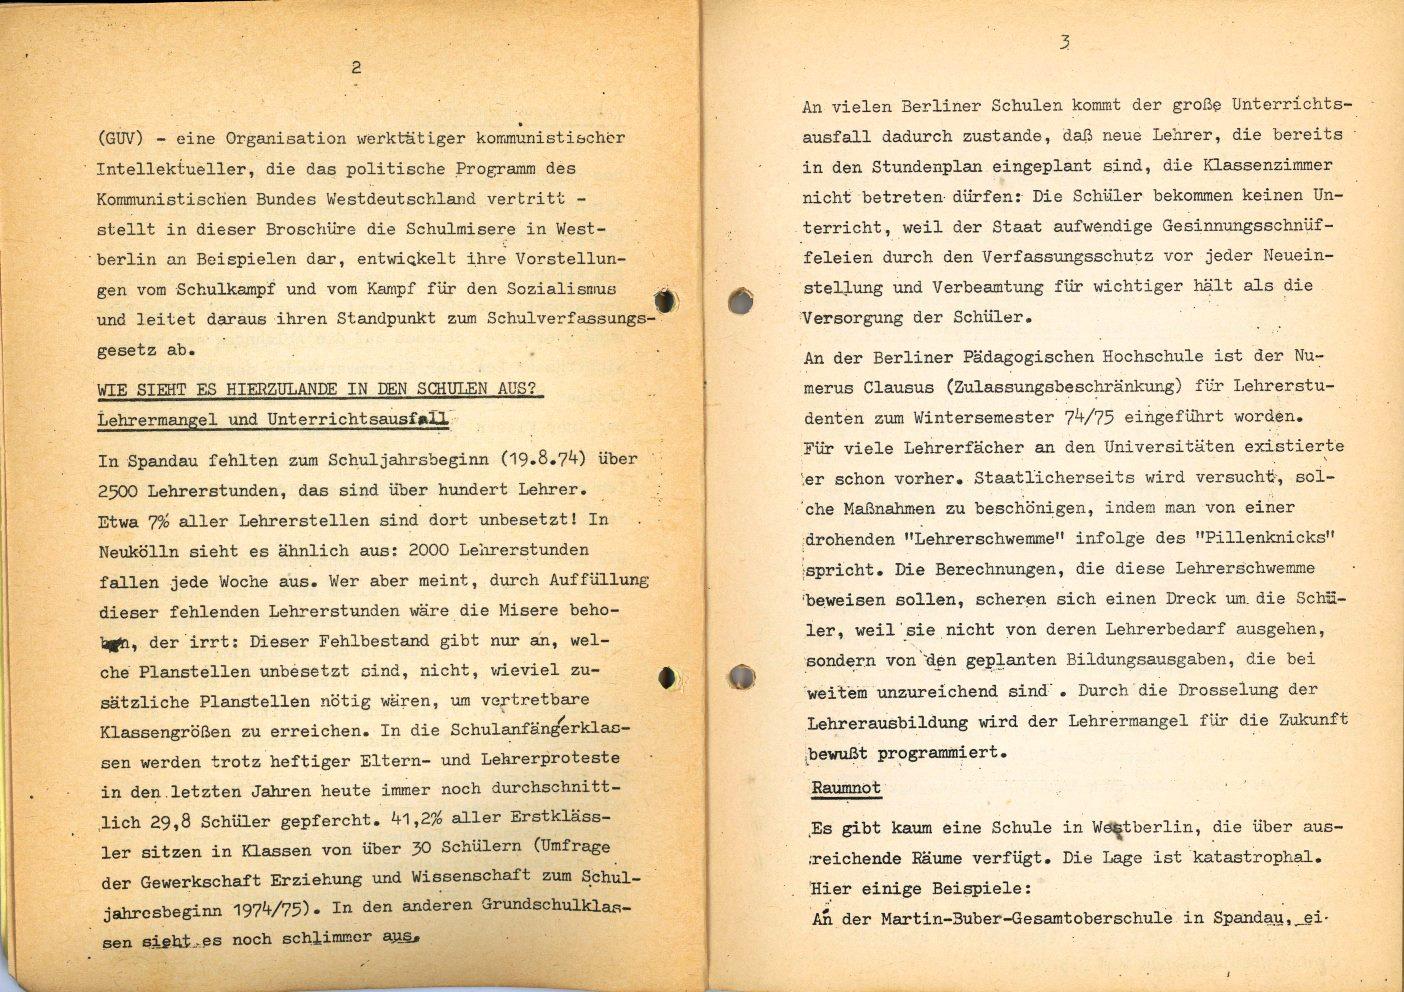 Berlin_SMV_GUV_1974_Schulmisere_04